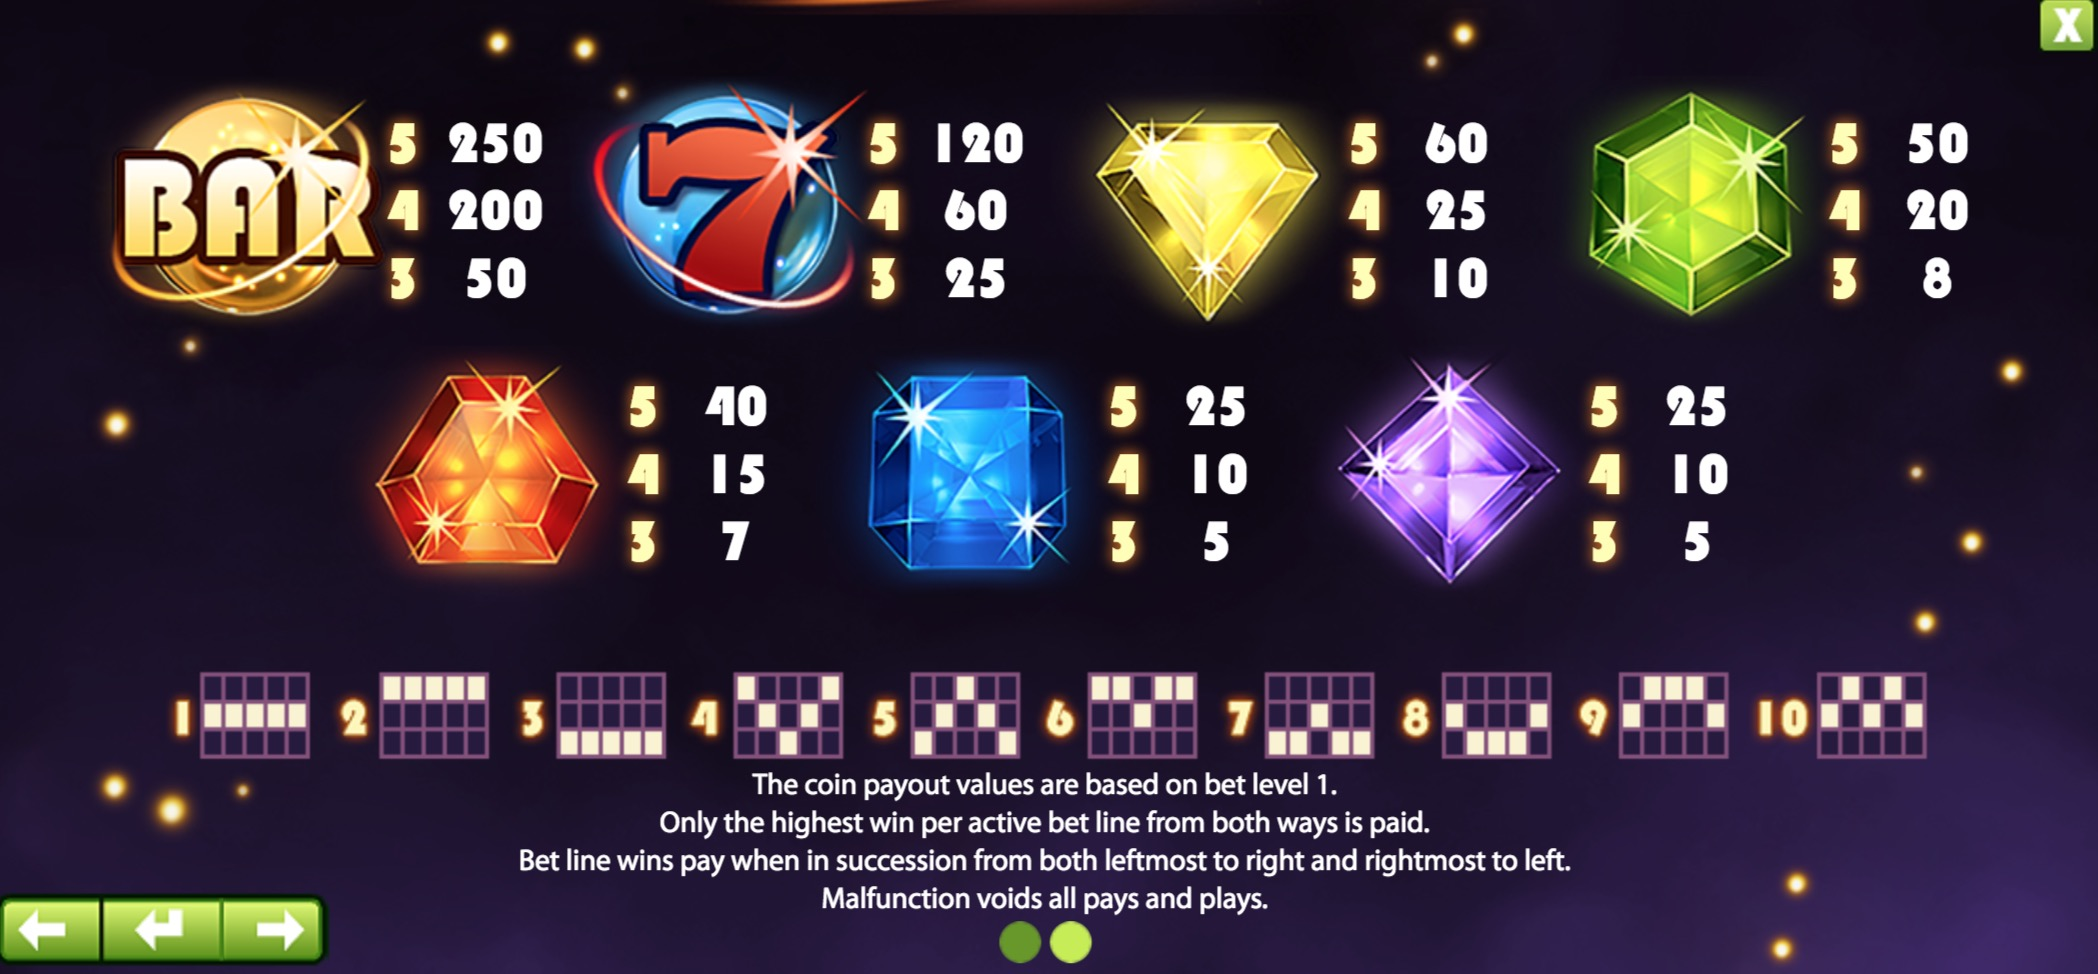 The Starburst Paytable